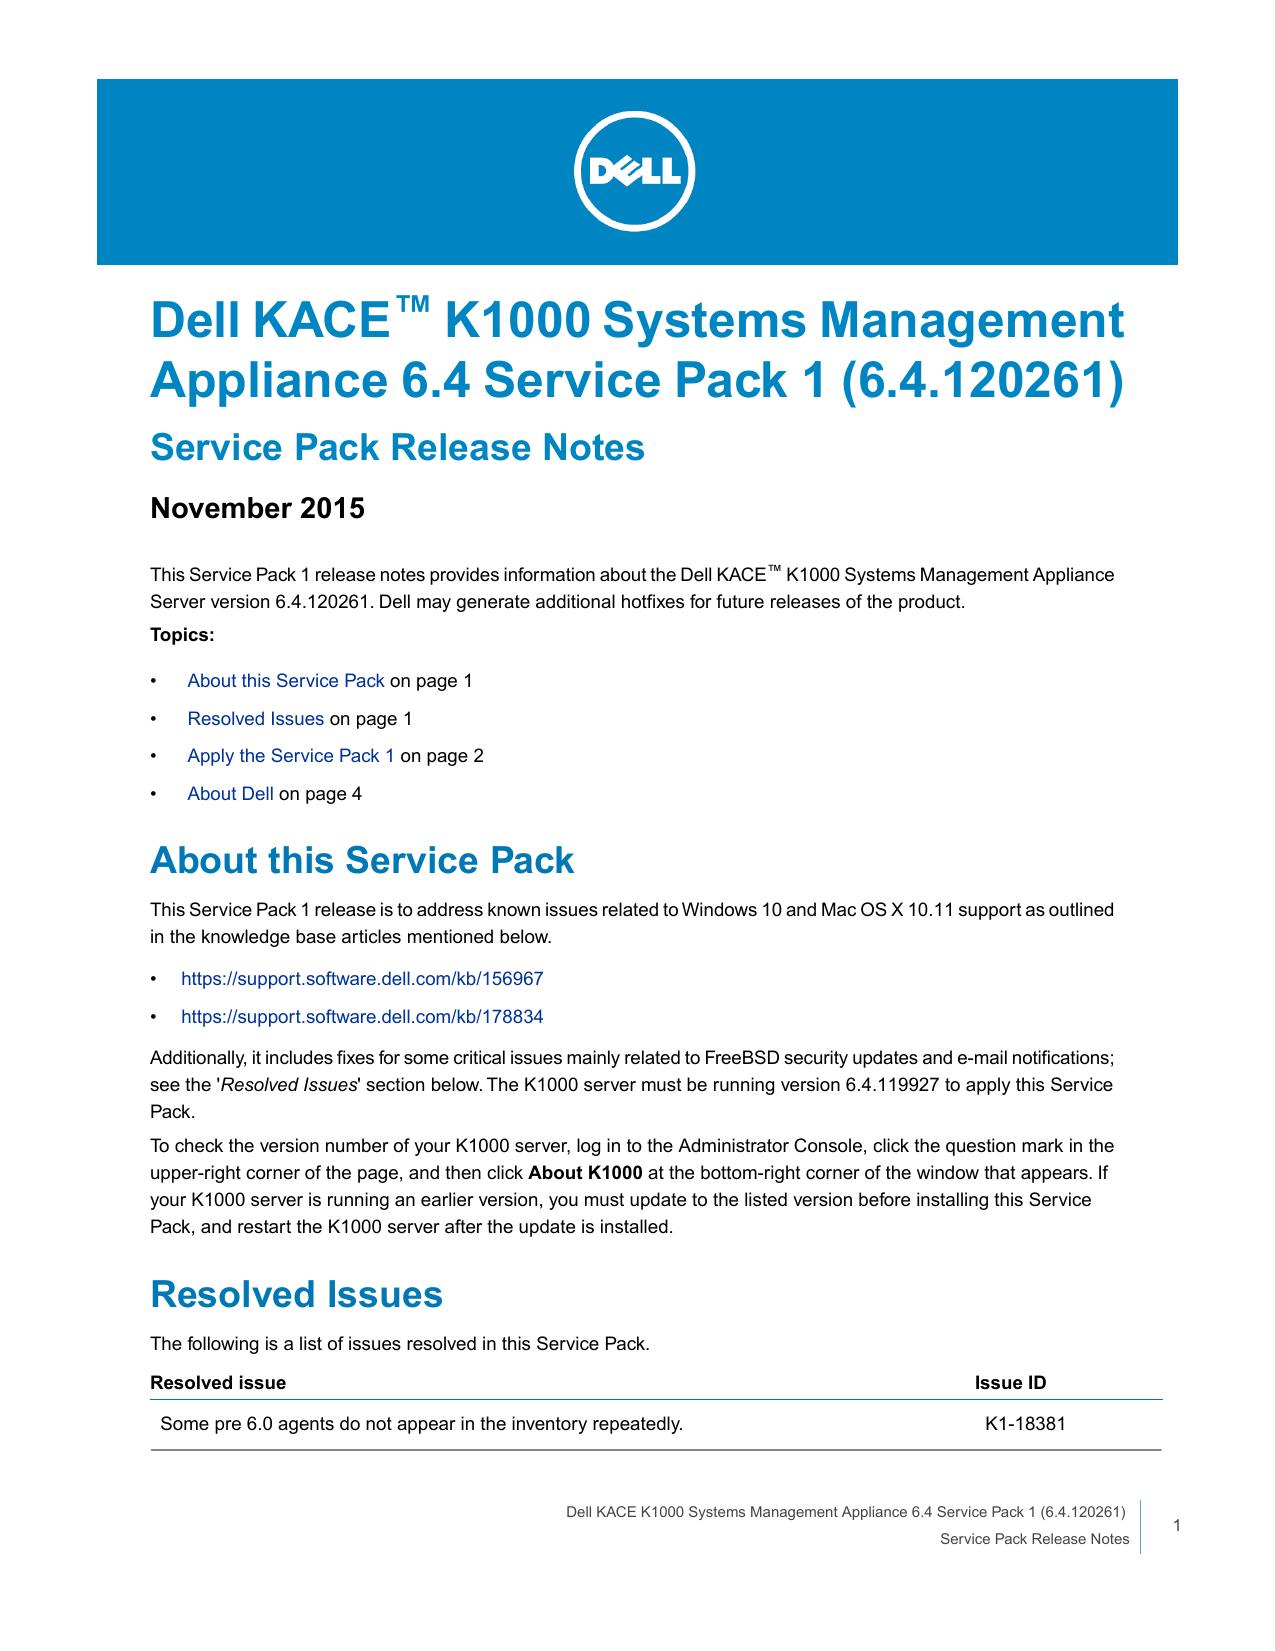 Dell KACE™ K1000 Systems Management Appliance 6.4 Service  b4d6933cf